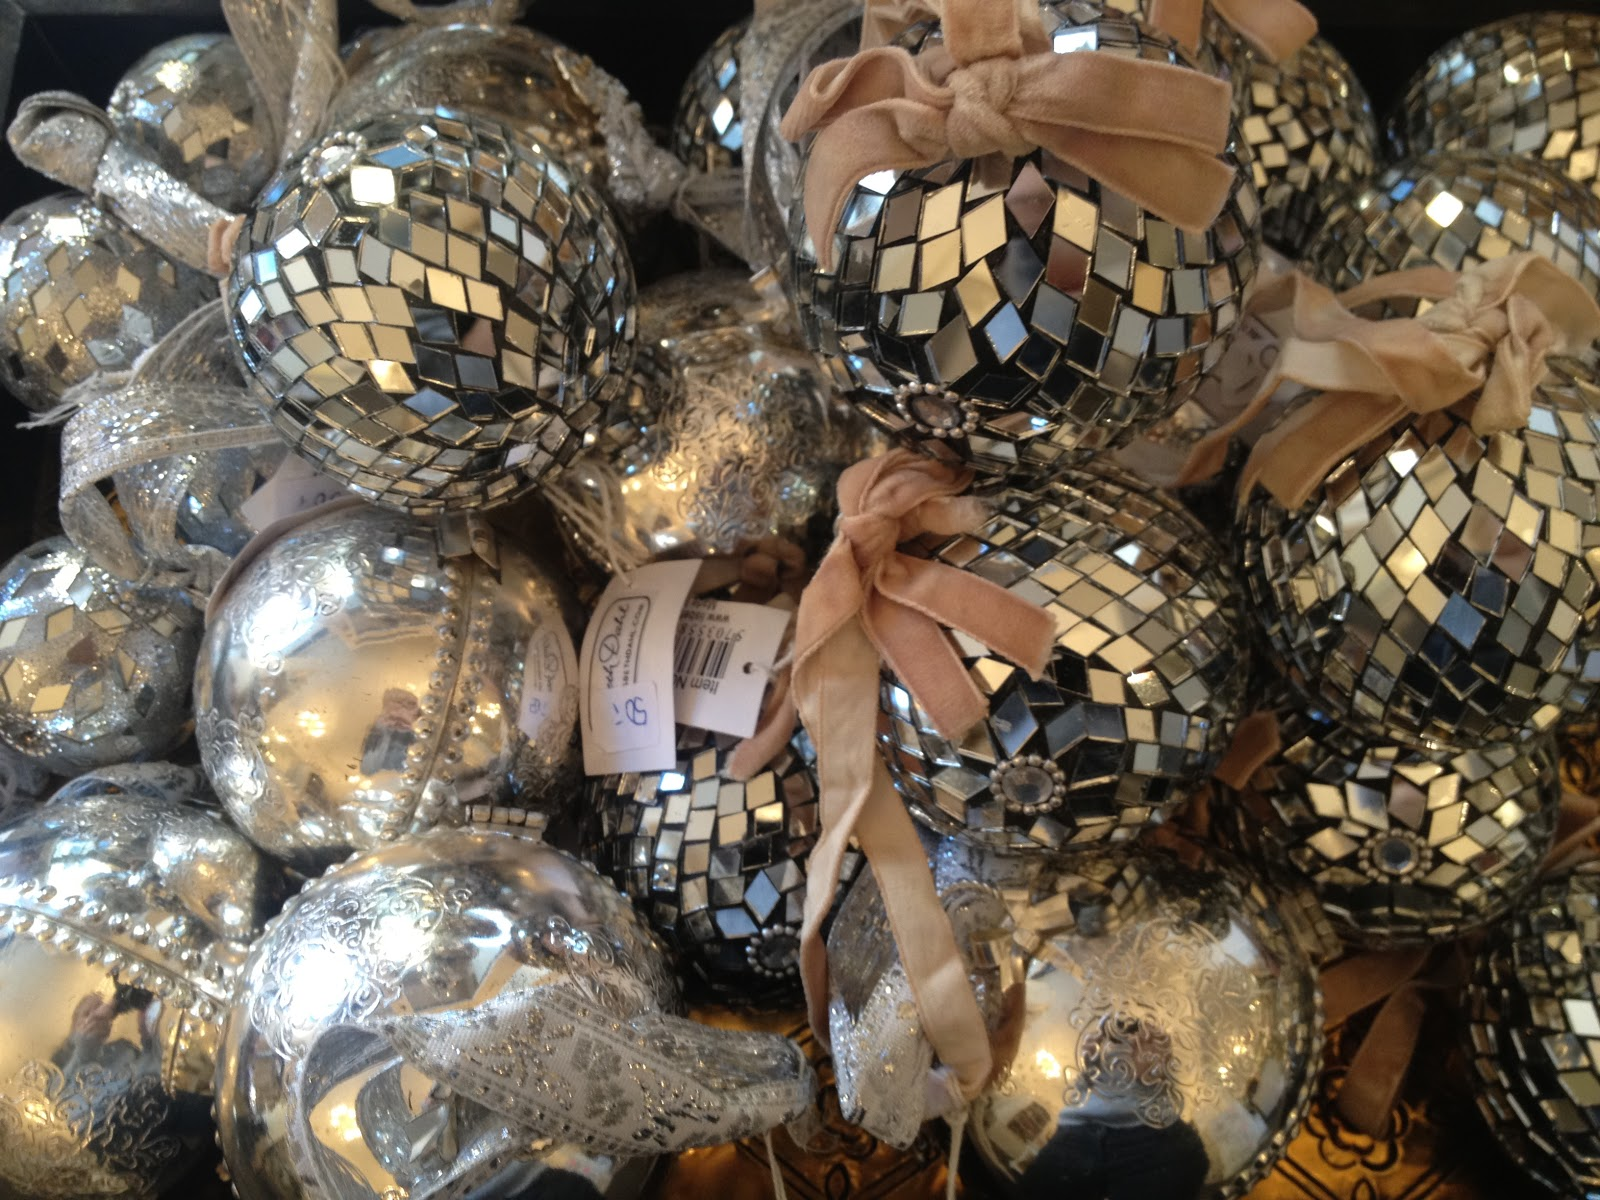 Julepynt salg leiligheten dekor - Billige weihnachtsdeko ...